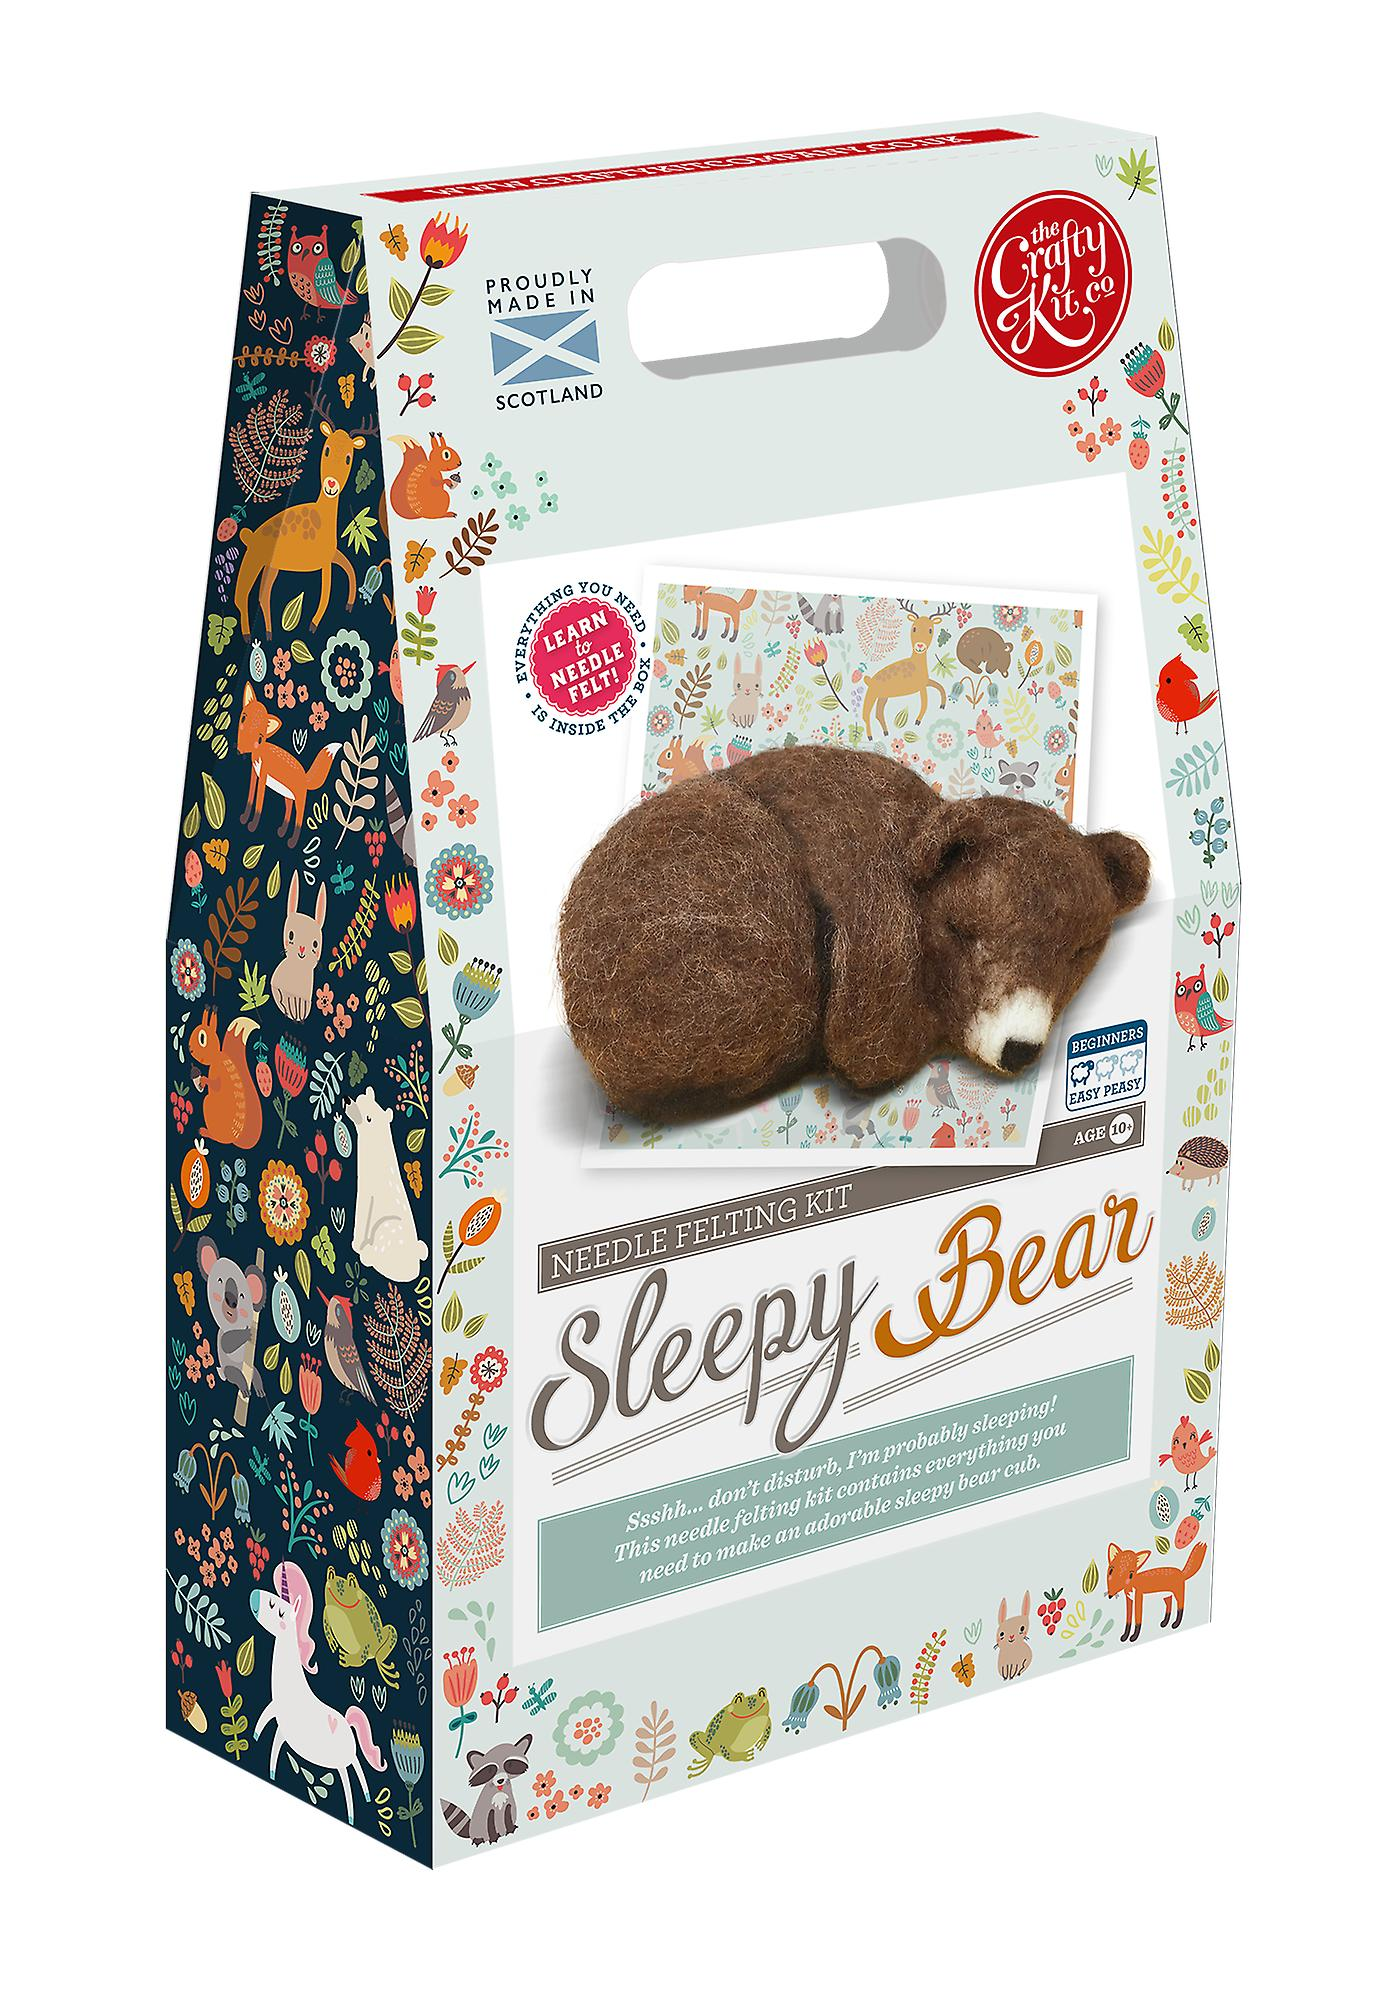 Sleepy Brown Bear Cub neula Huovutus Kit